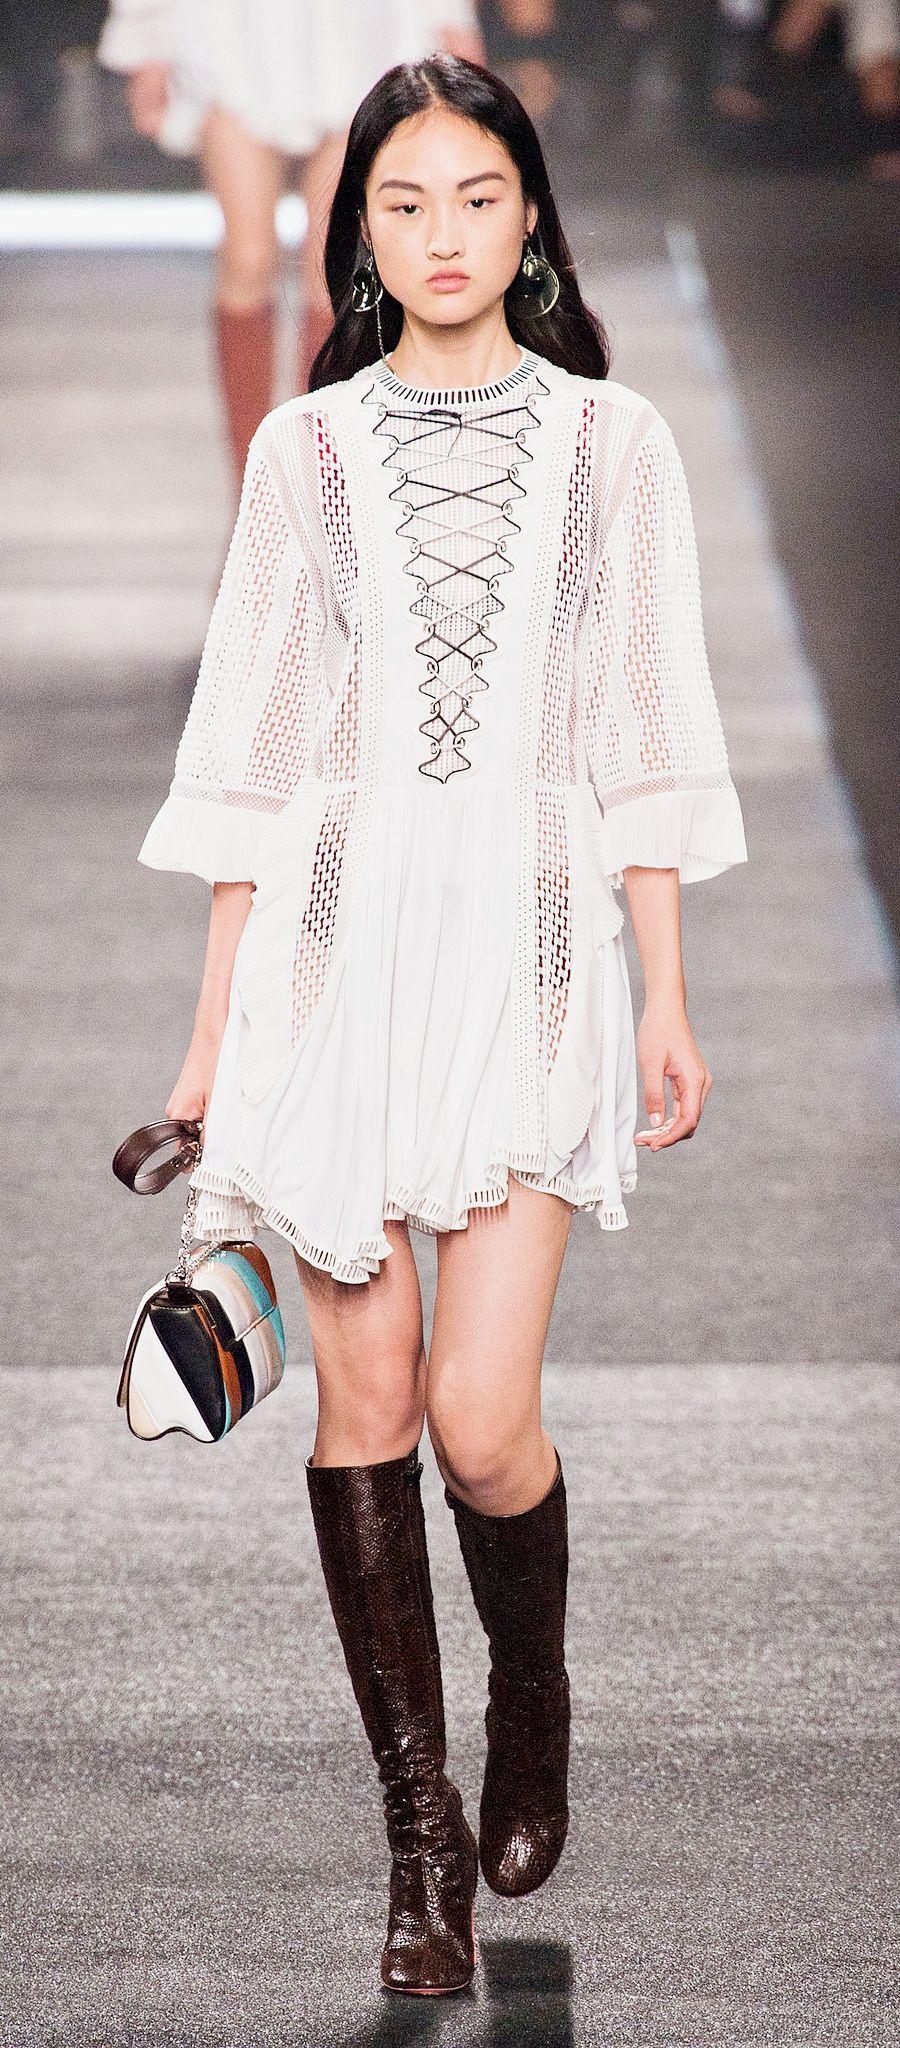 Louis vuitton spring us style the white dress pinterest